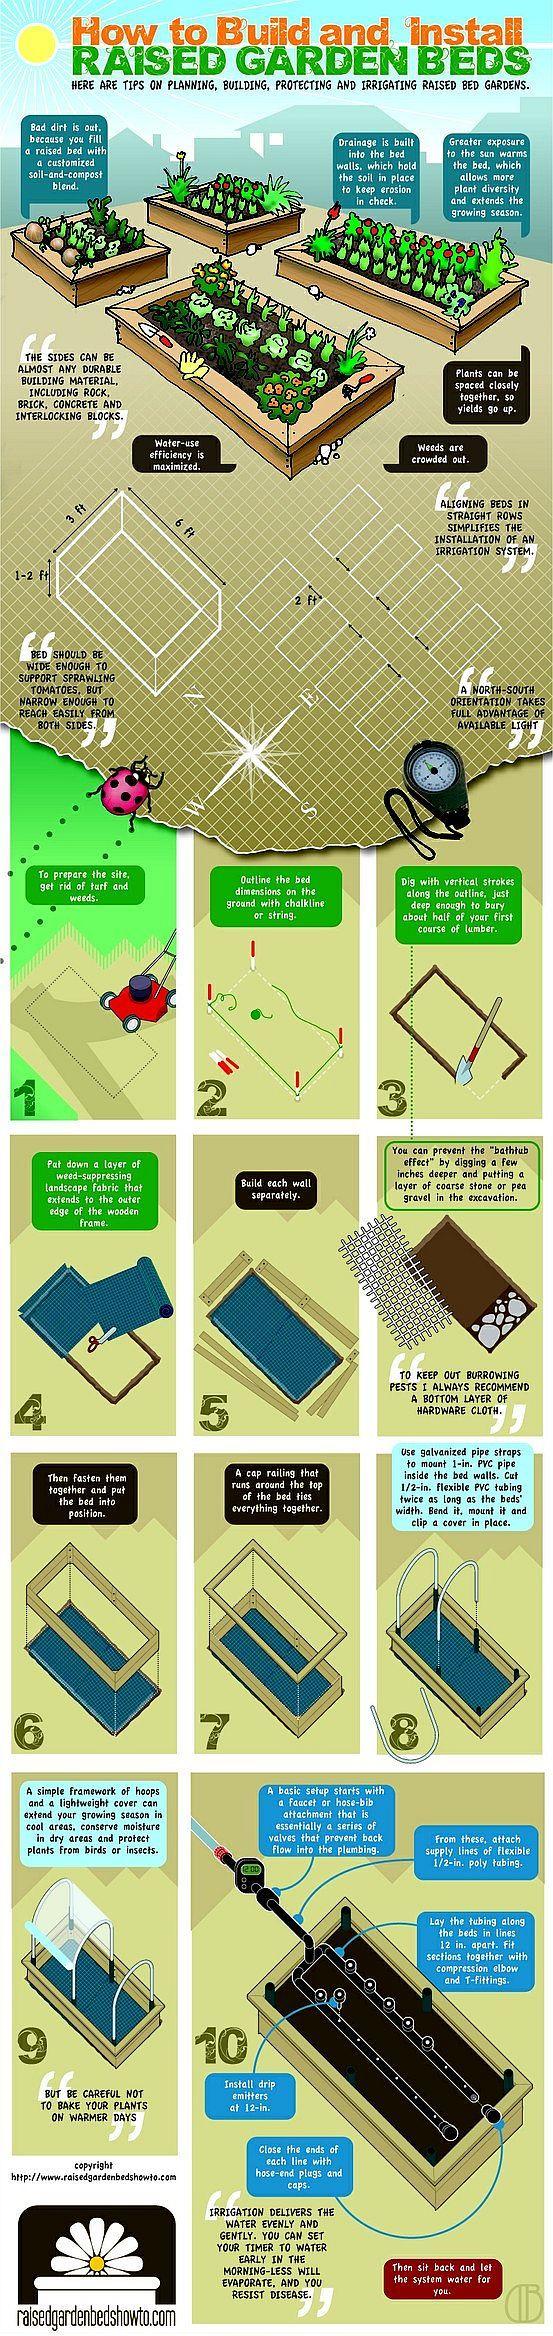 1G. DIY Garden Projects Anyone Can Make - Photo 02